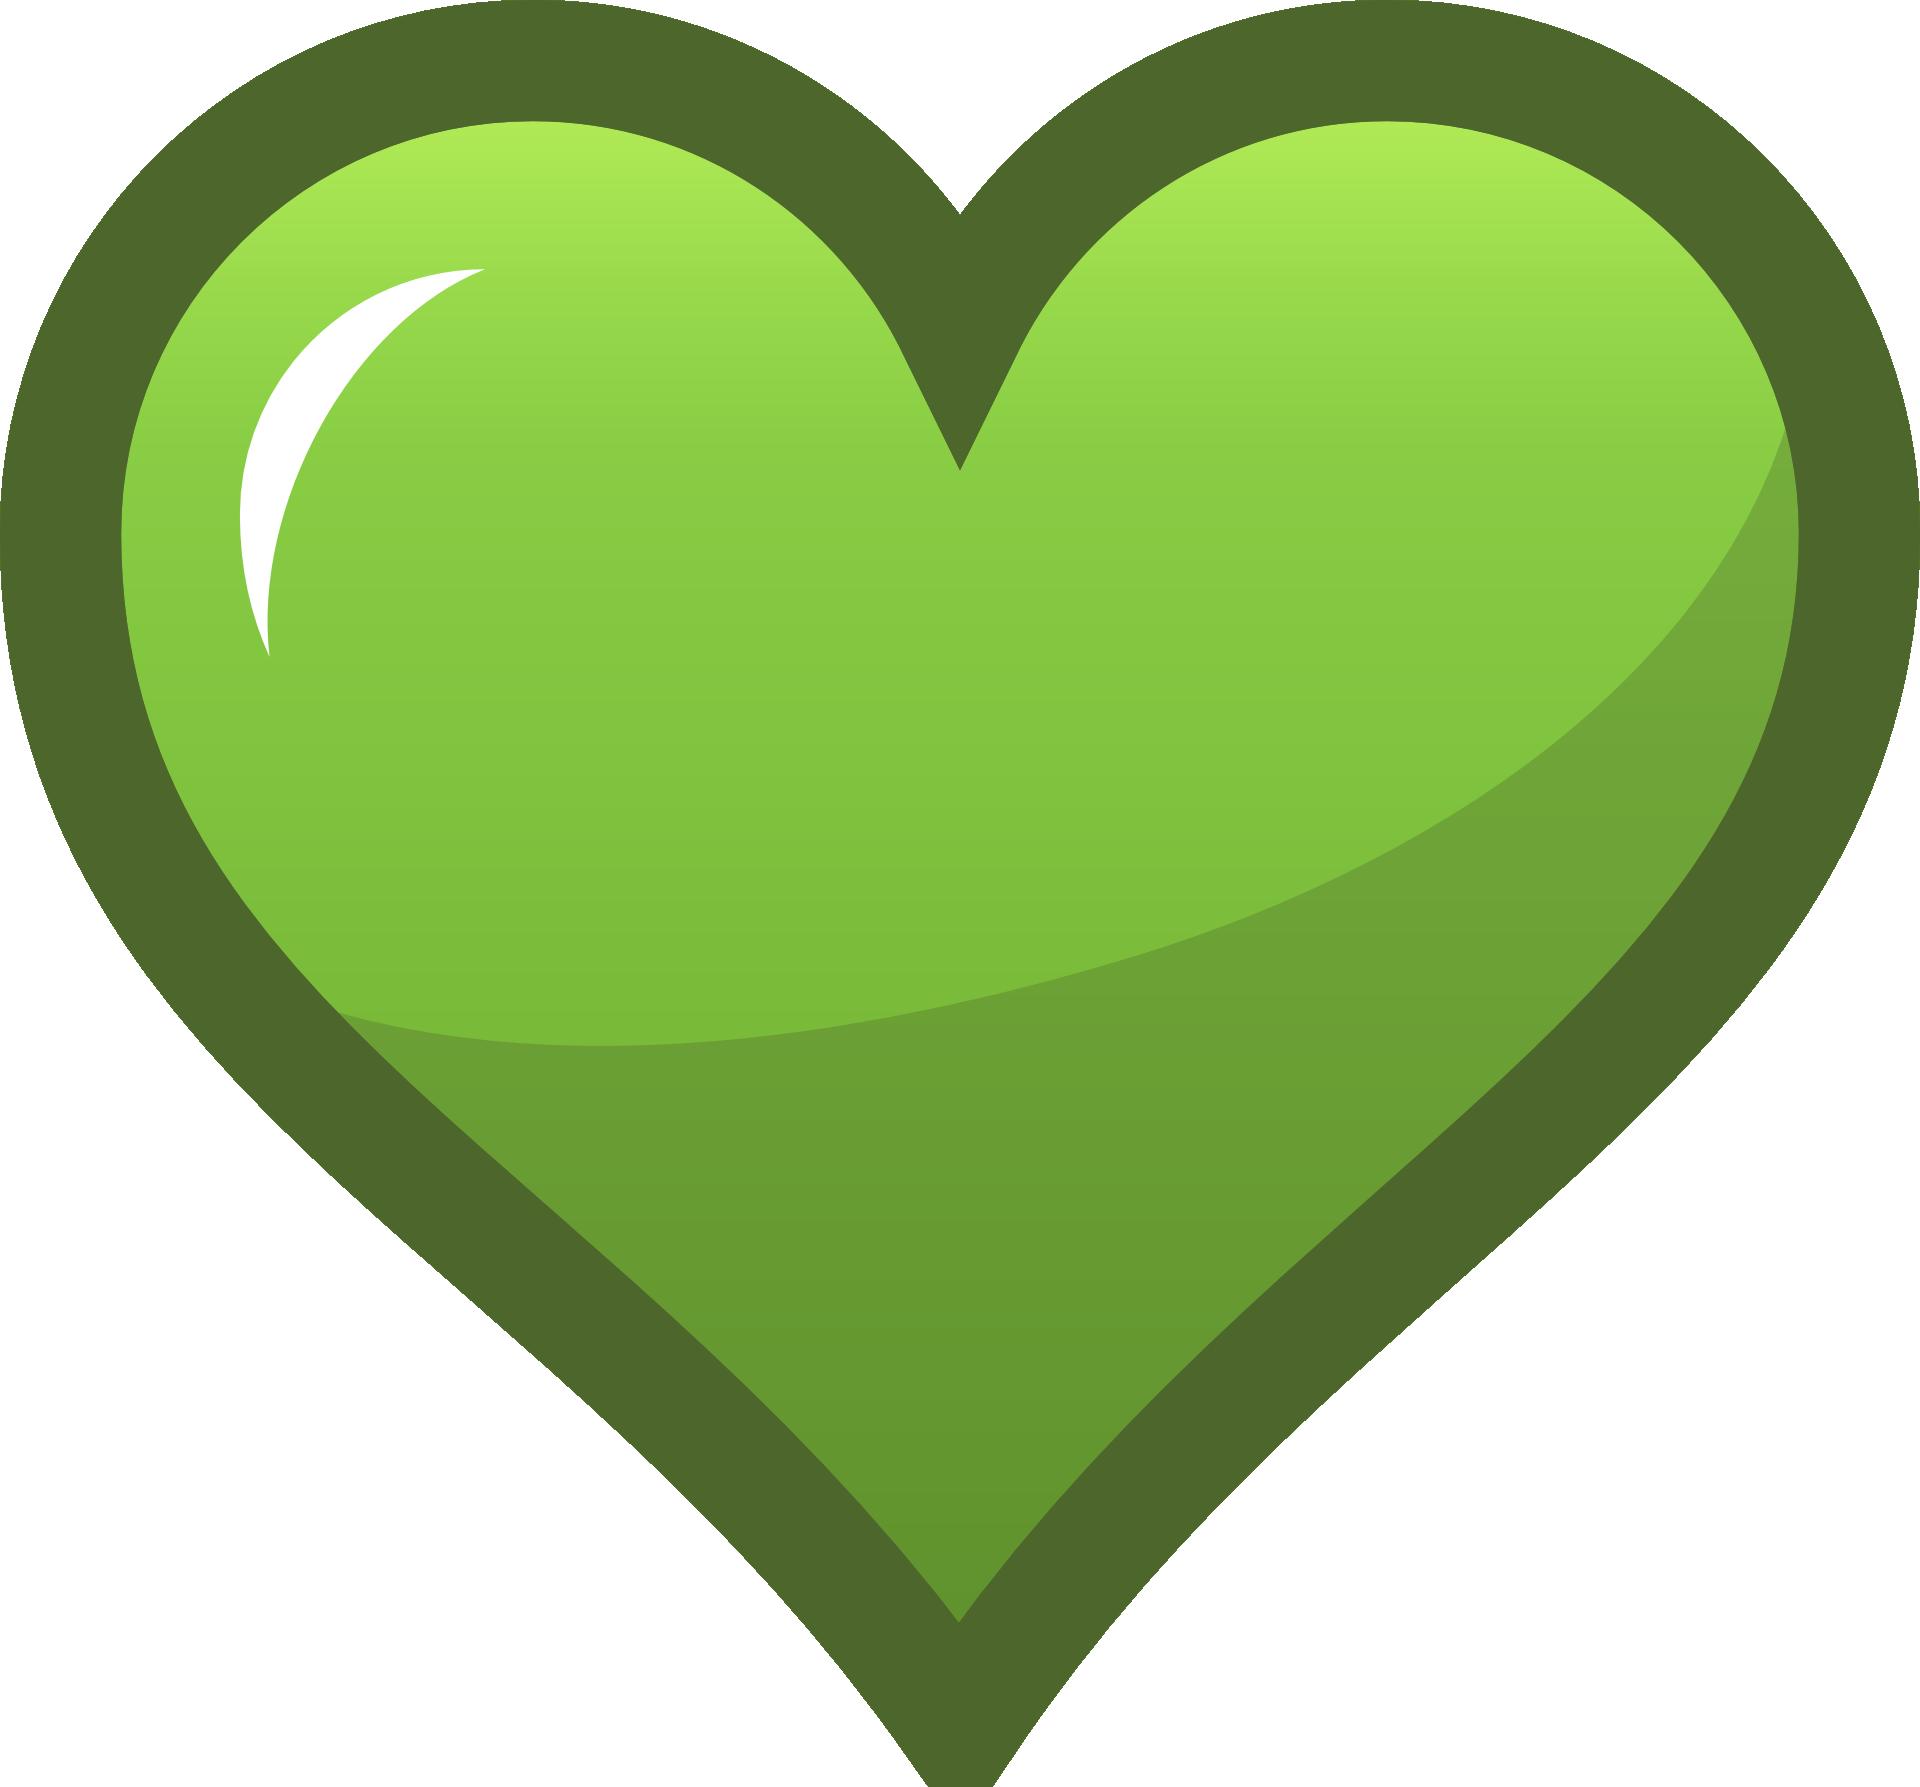 Big green heart clipart free image.